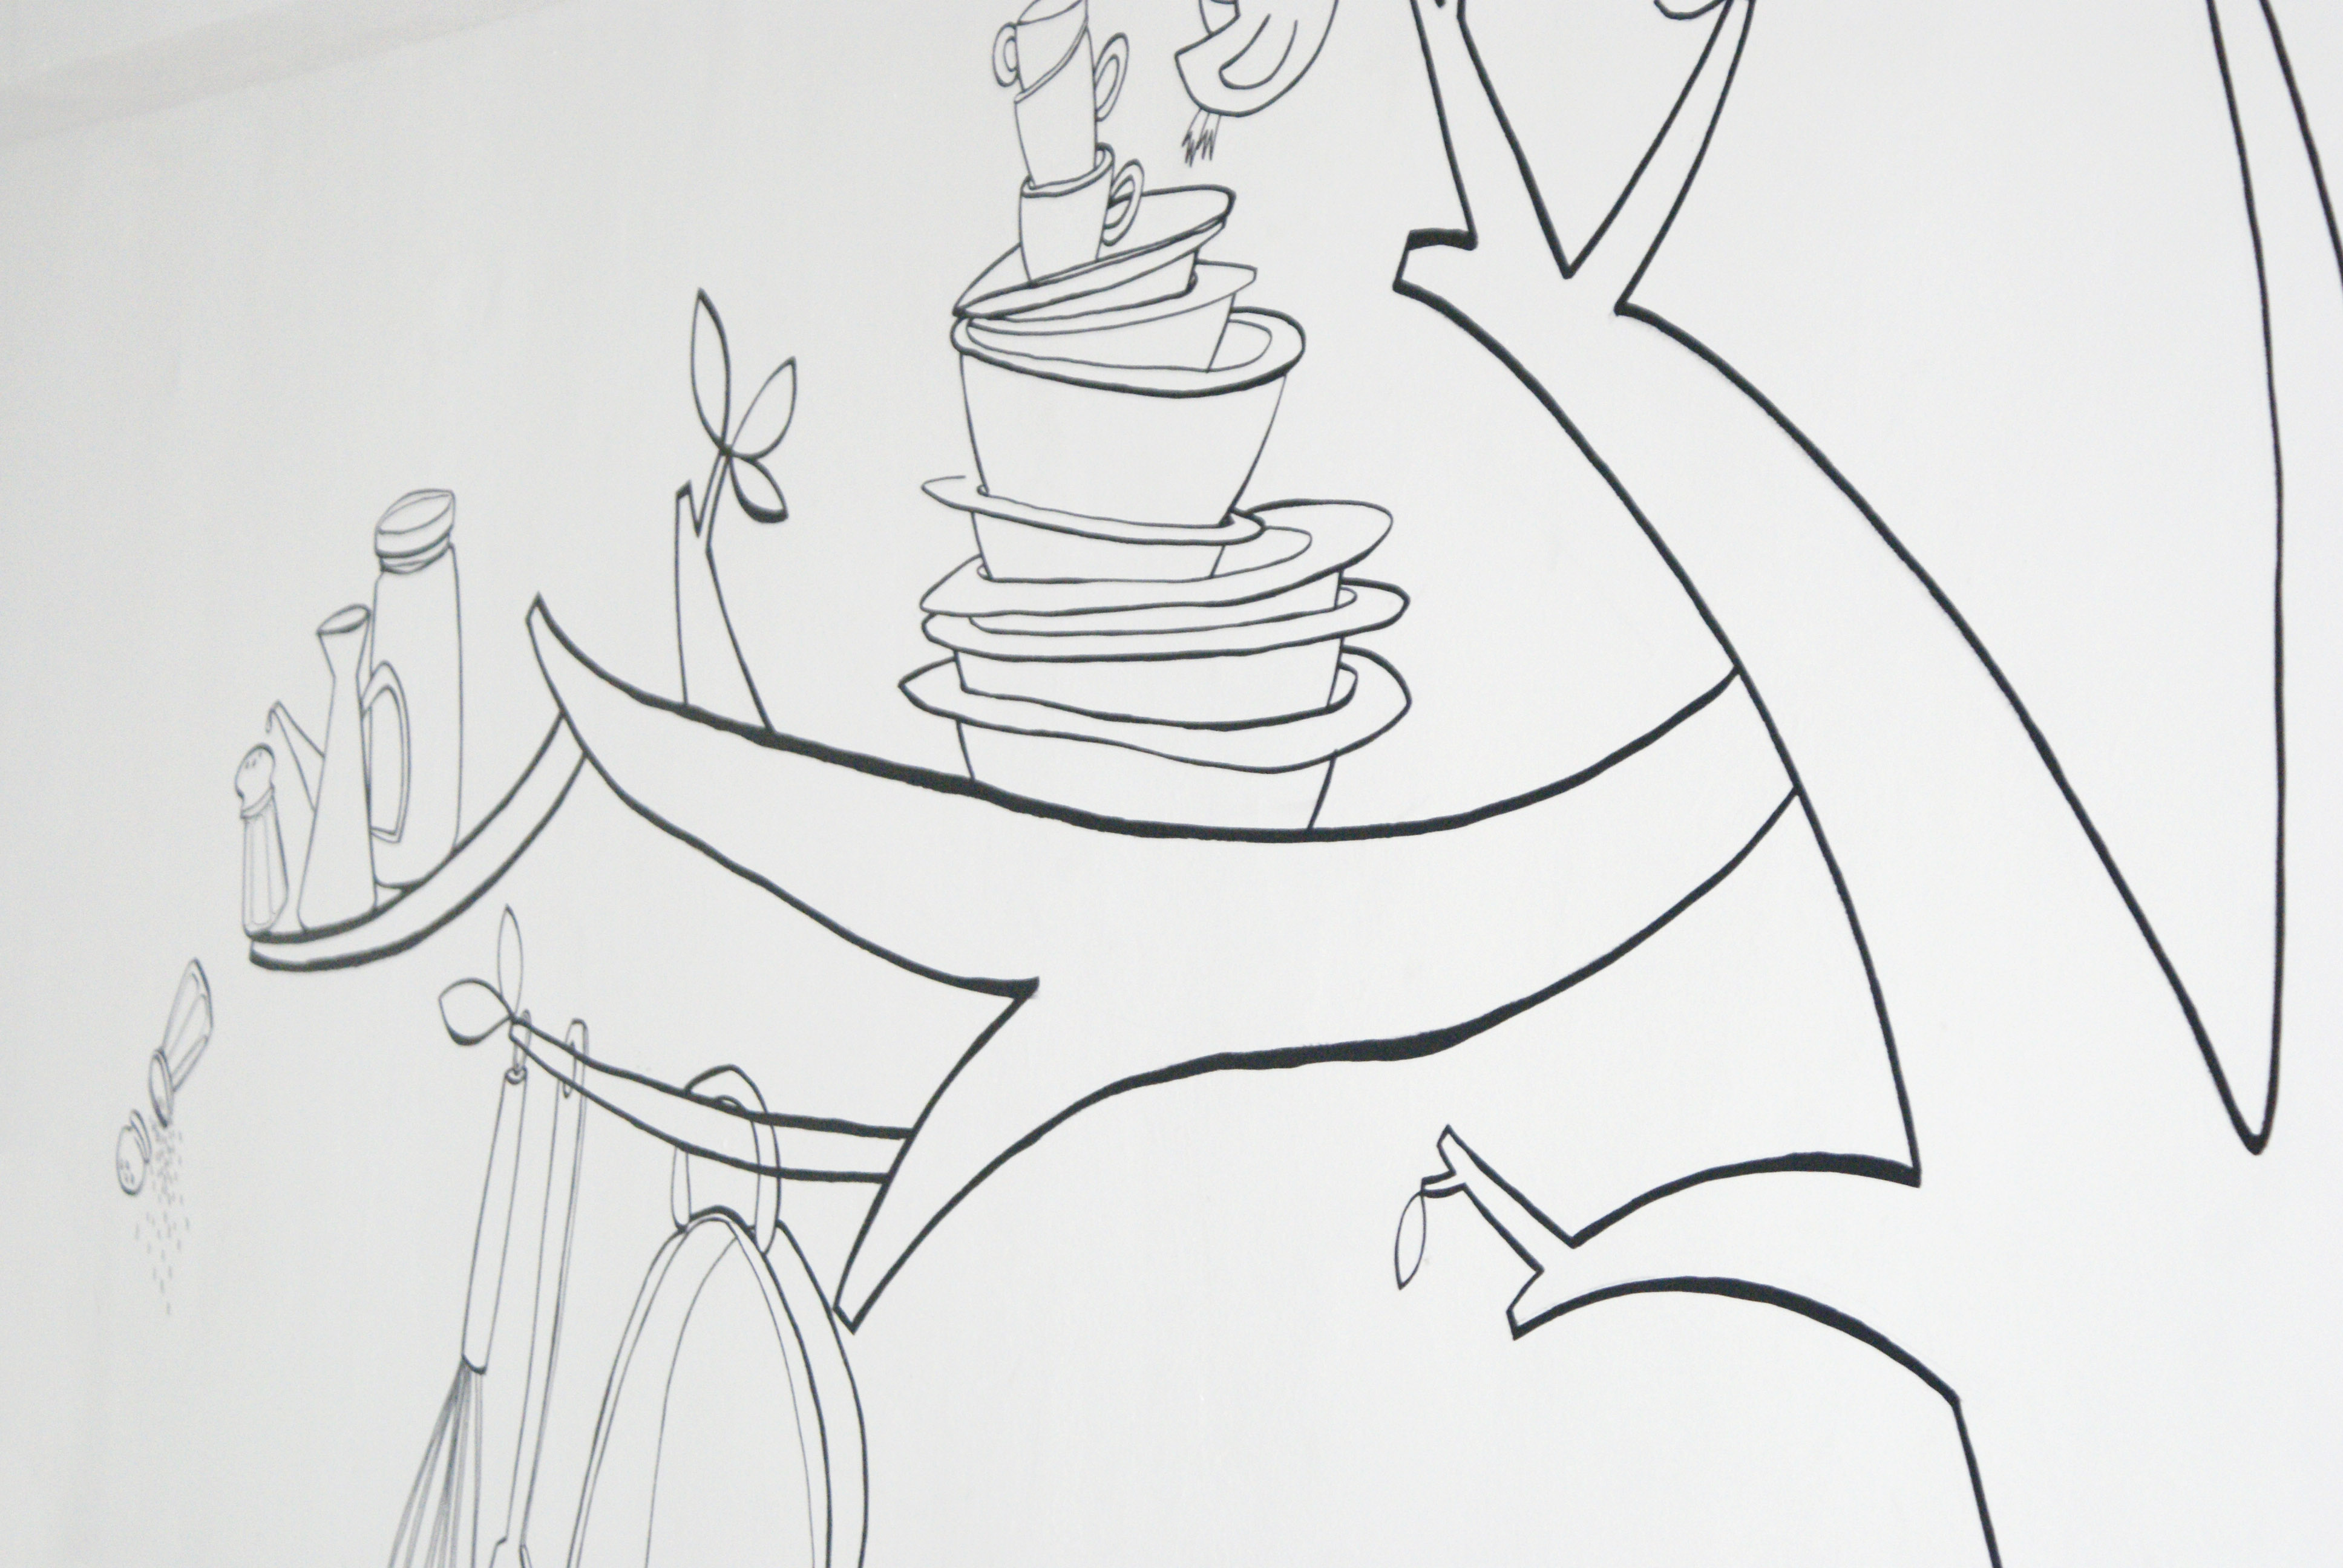 00_dibujando2